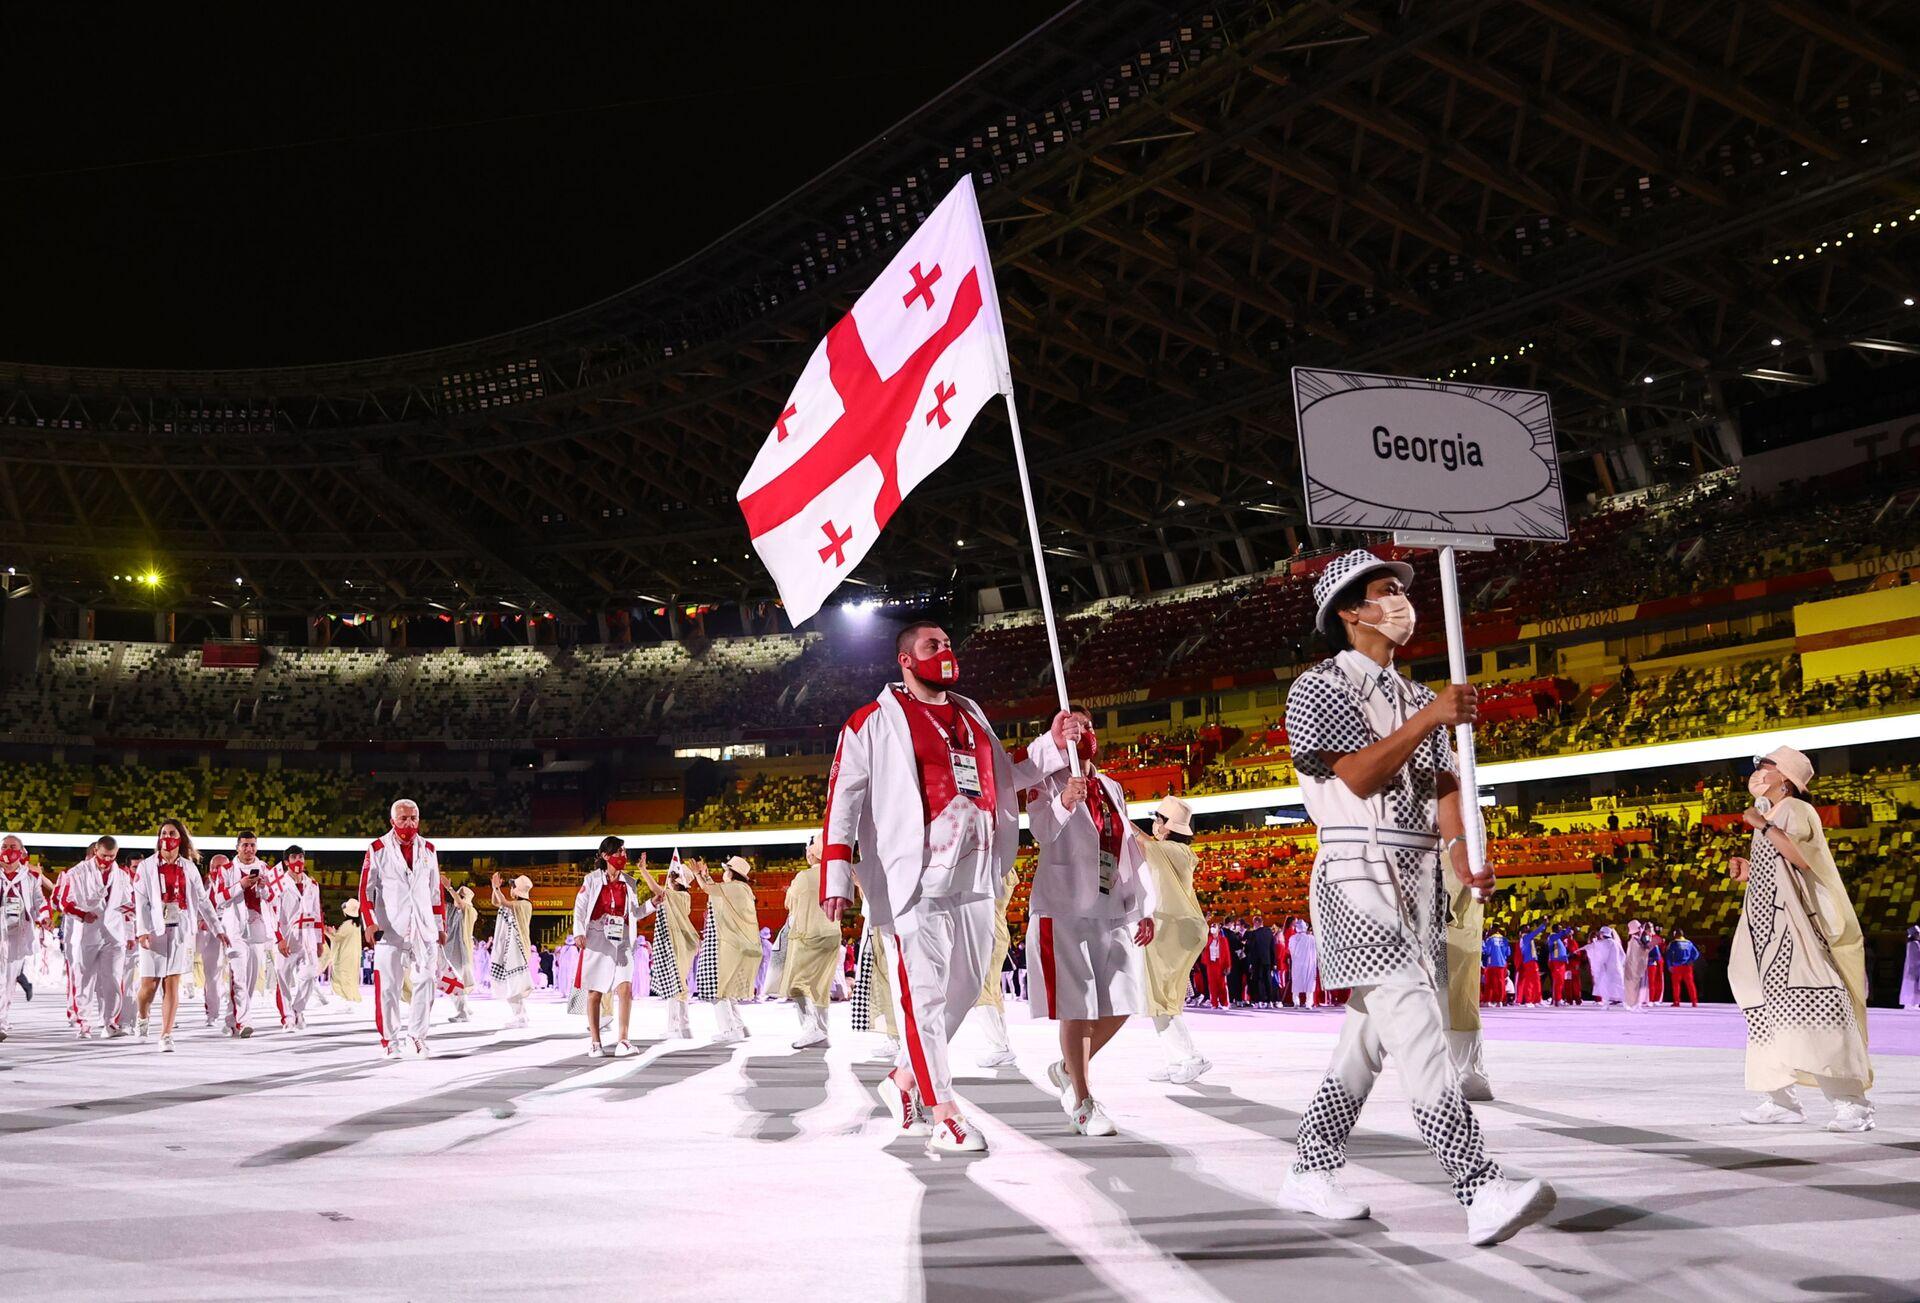 Олимпиада в Токио - грузинская сборная  - Sputnik საქართველო, 1920, 24.08.2021